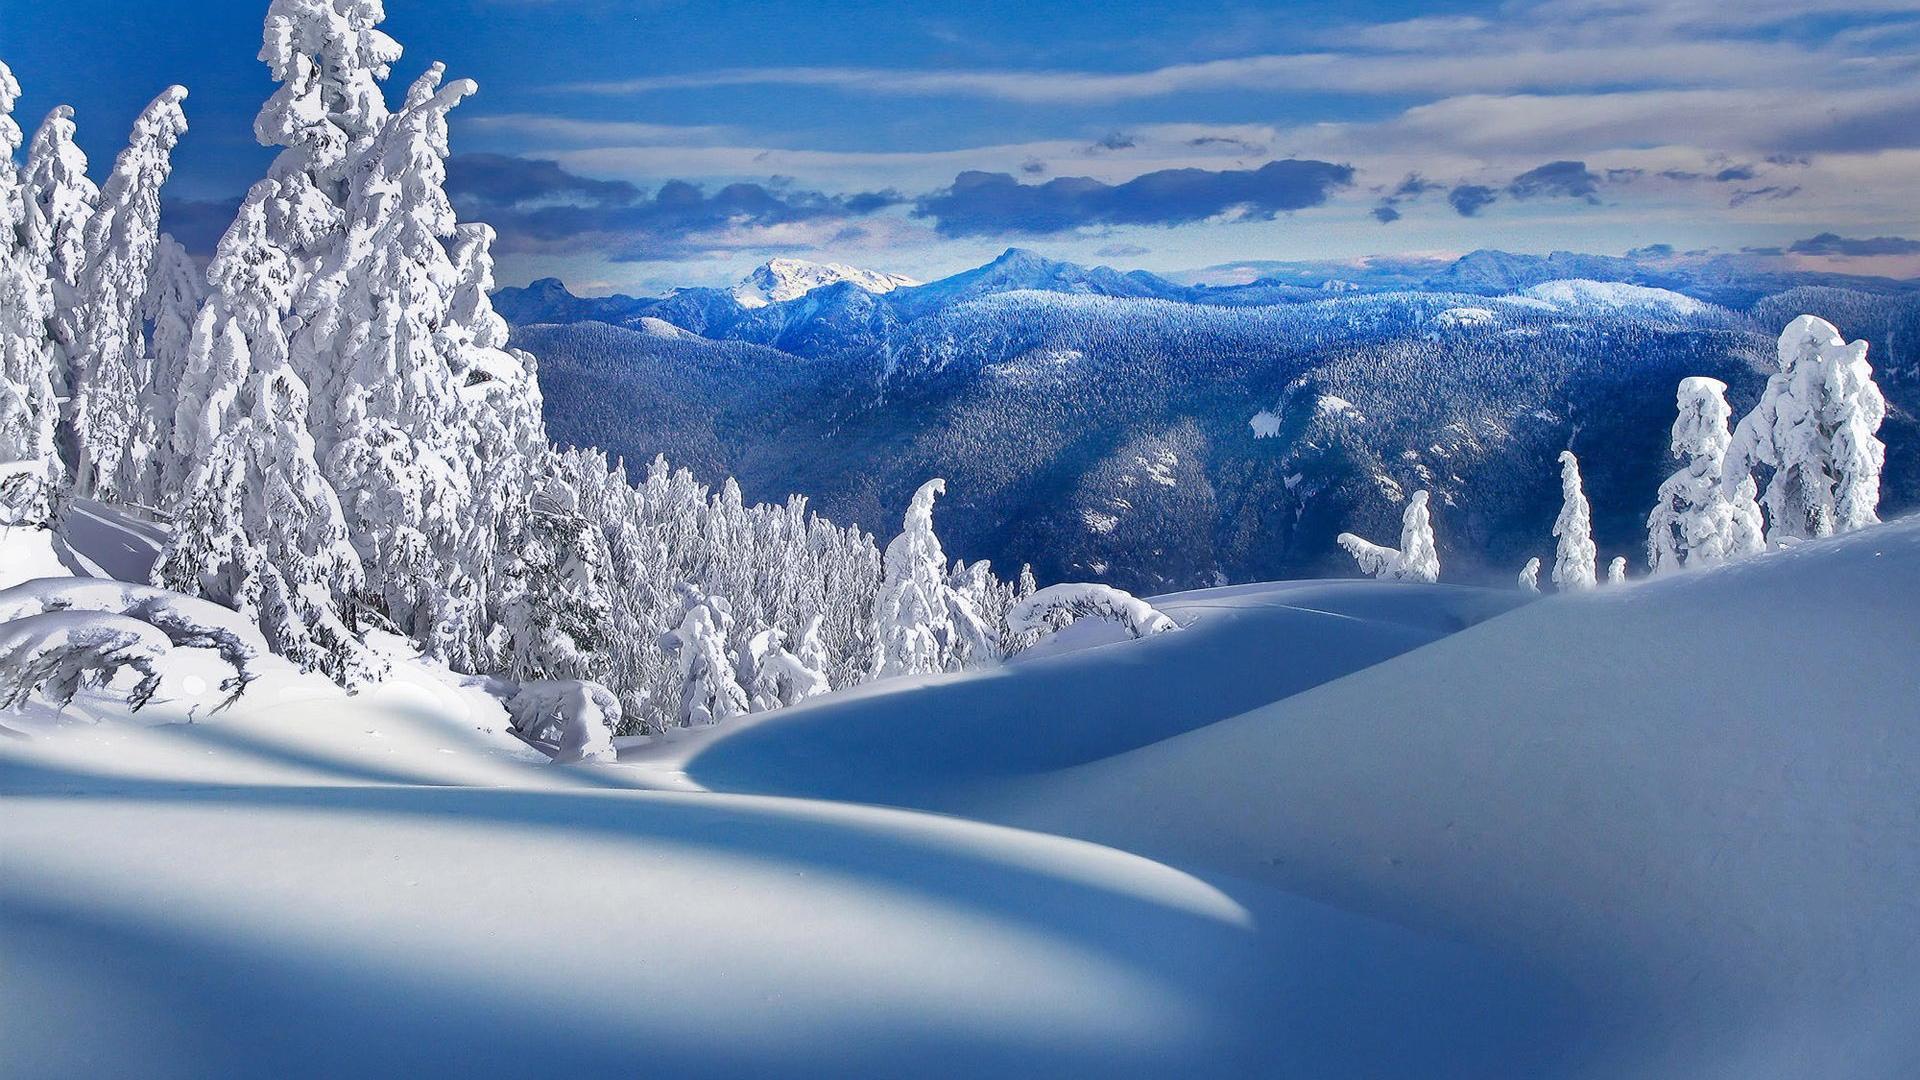 Snow HD Wallpaper   Wallpaper High Definition High Quality 1920x1080